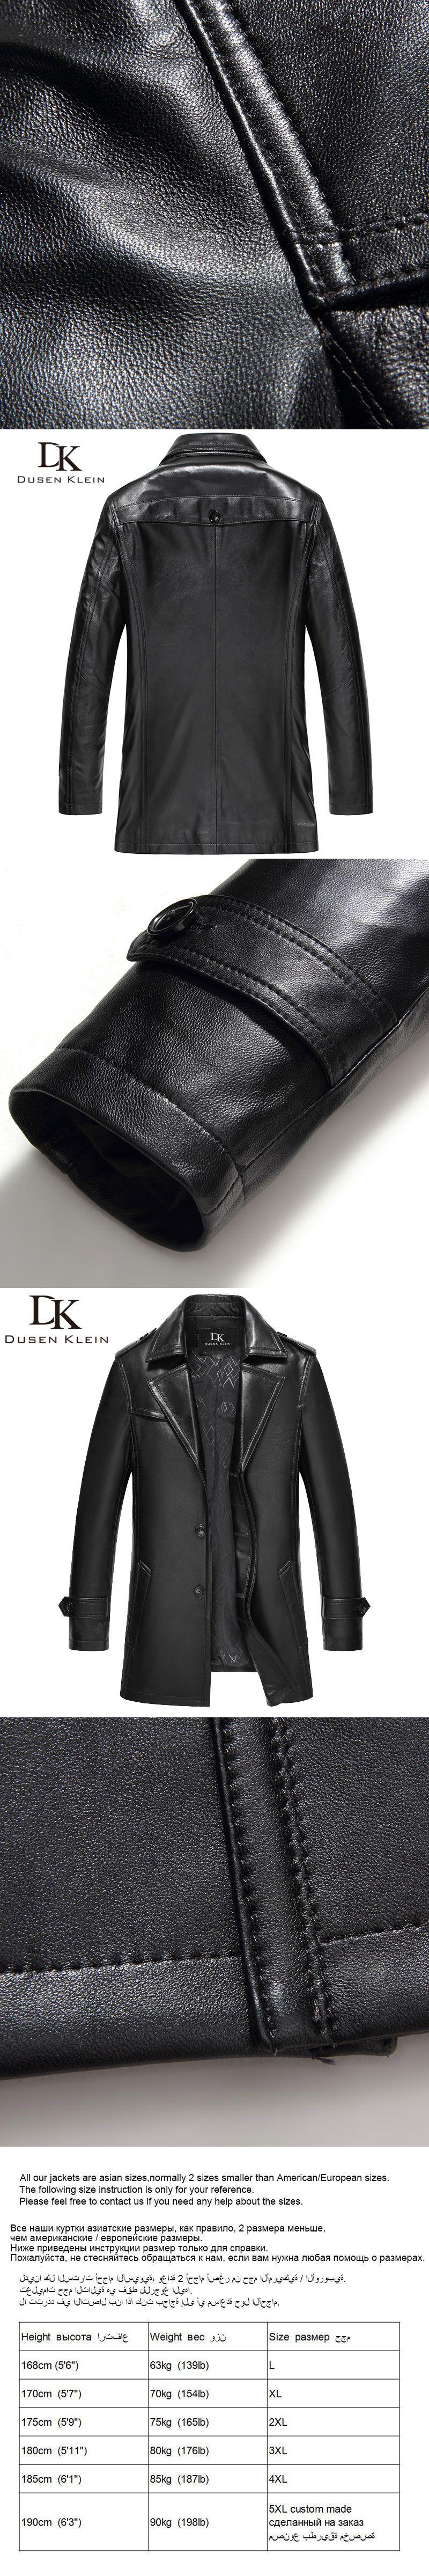 5189398eaa7f Dusen Klein Brand Genuine leather men jacket Sheepskin Mid-long slim  Designer spring leather